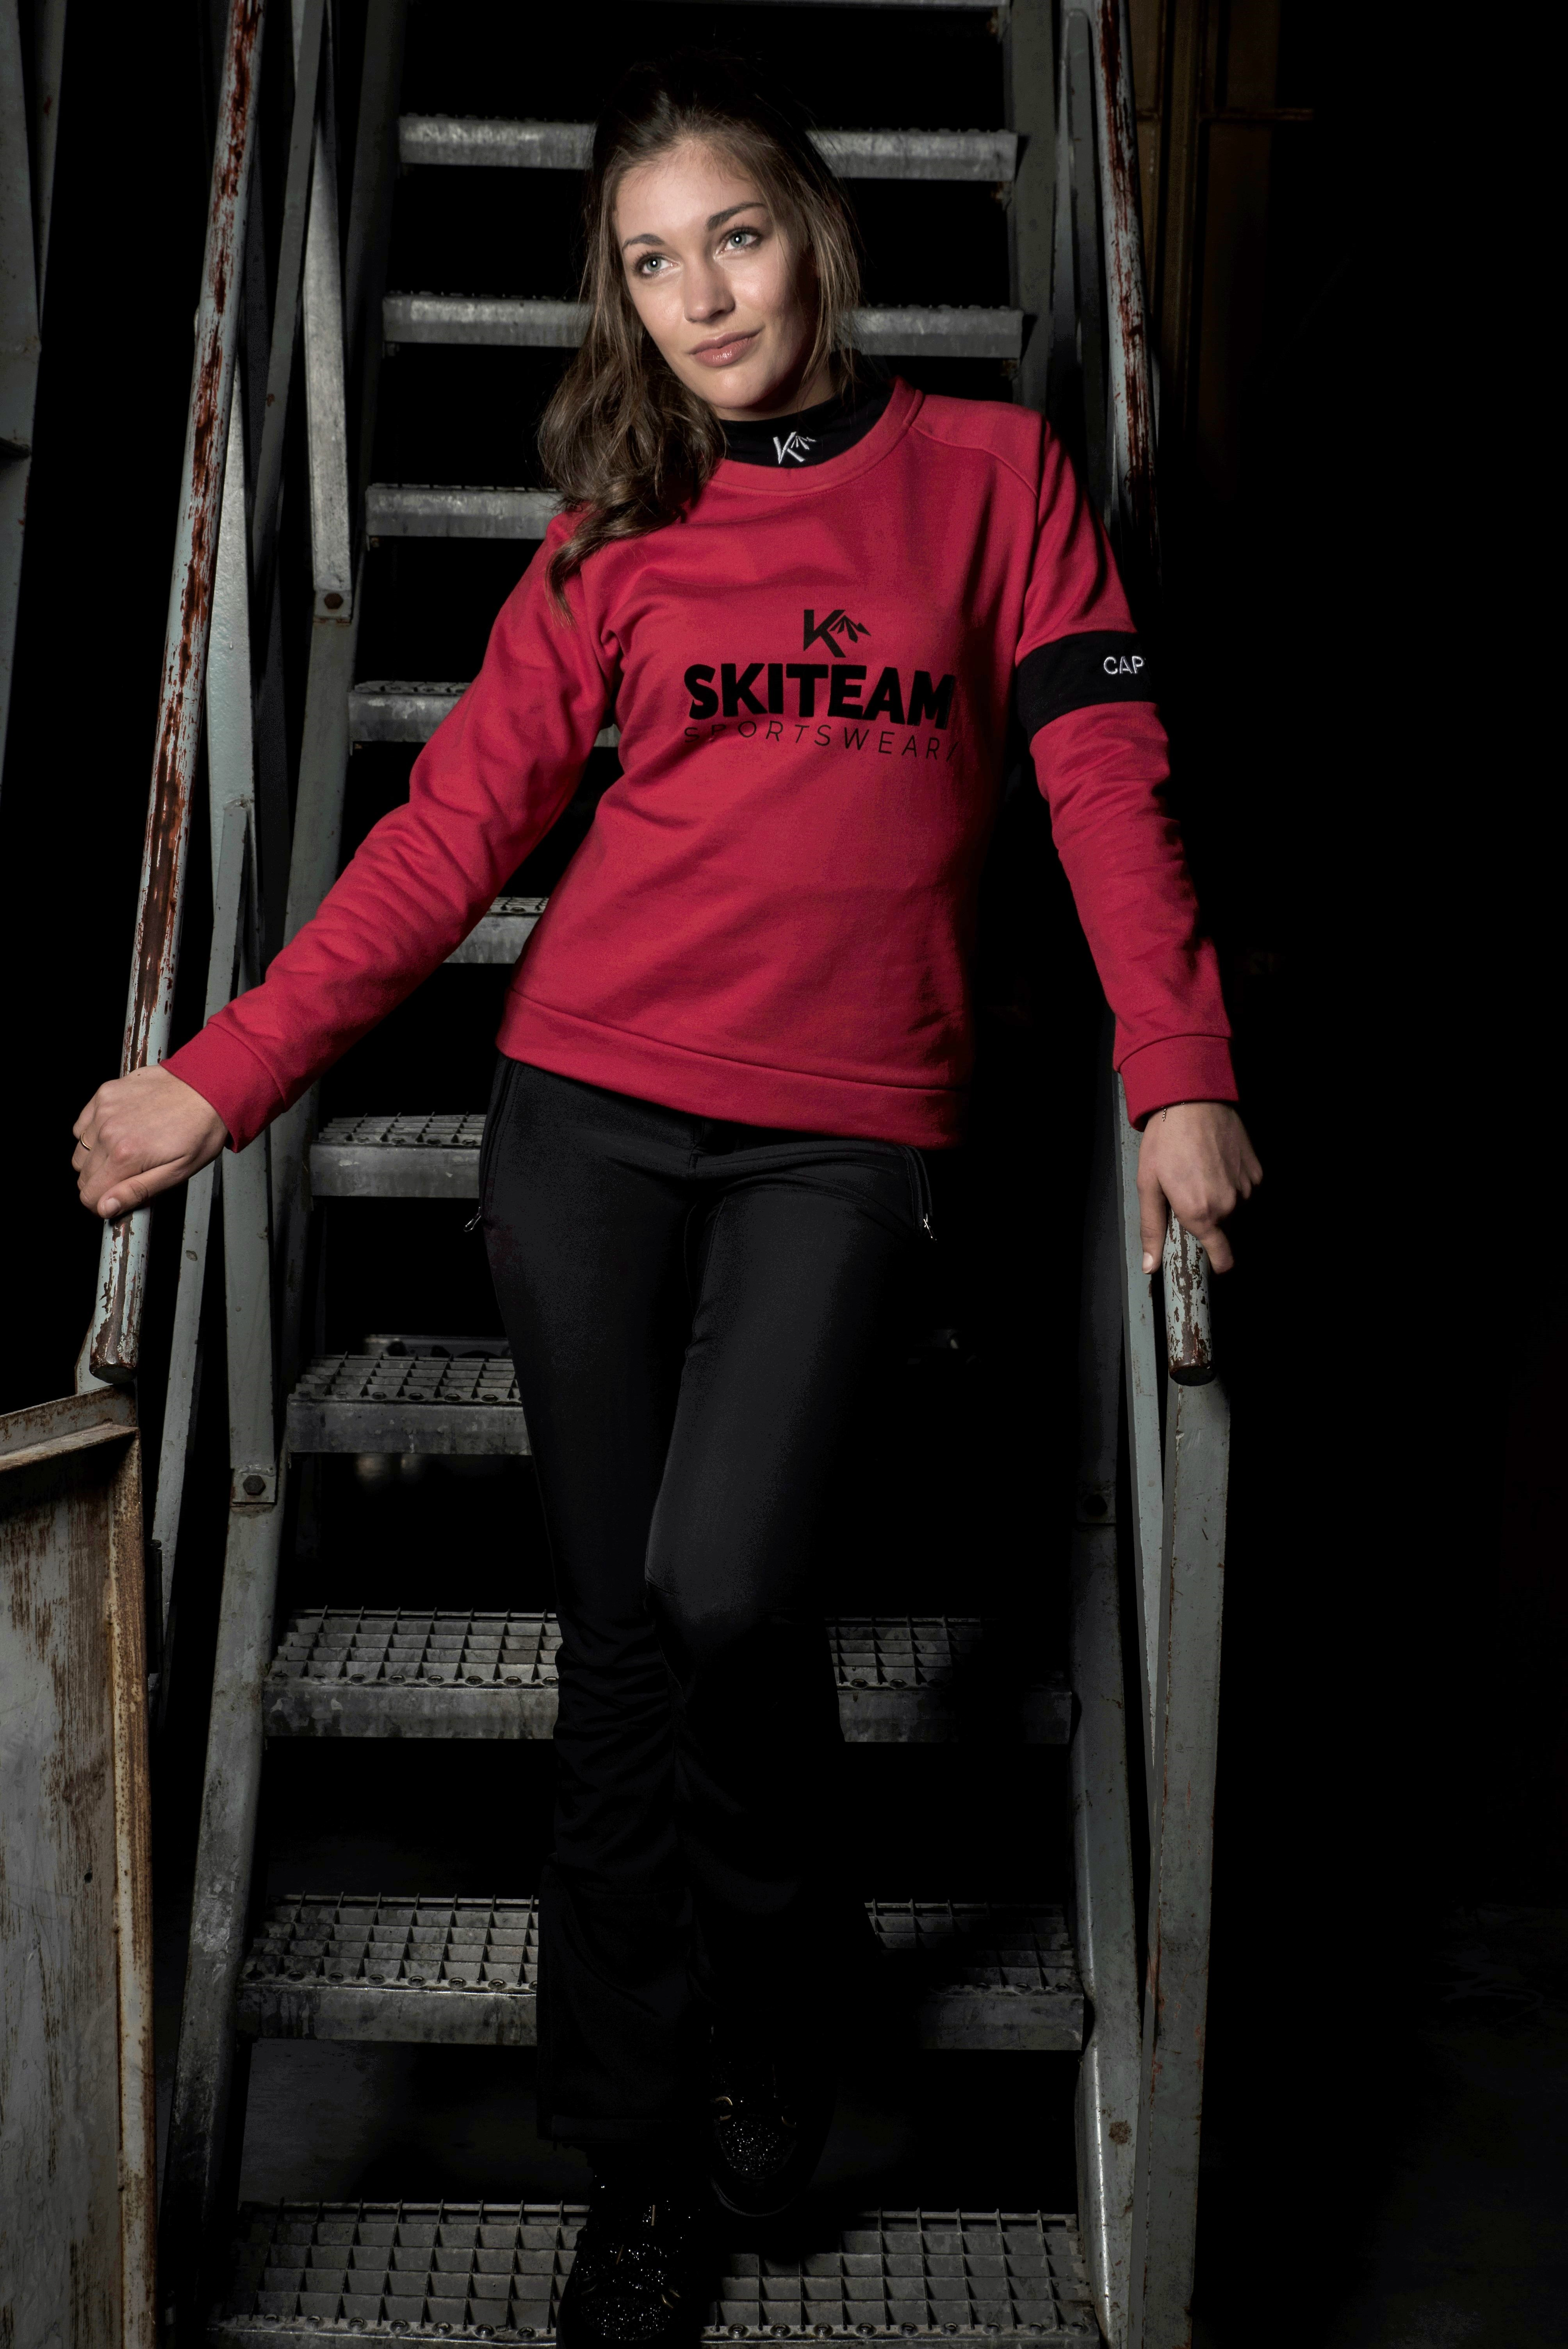 Dames trui skiteam rood